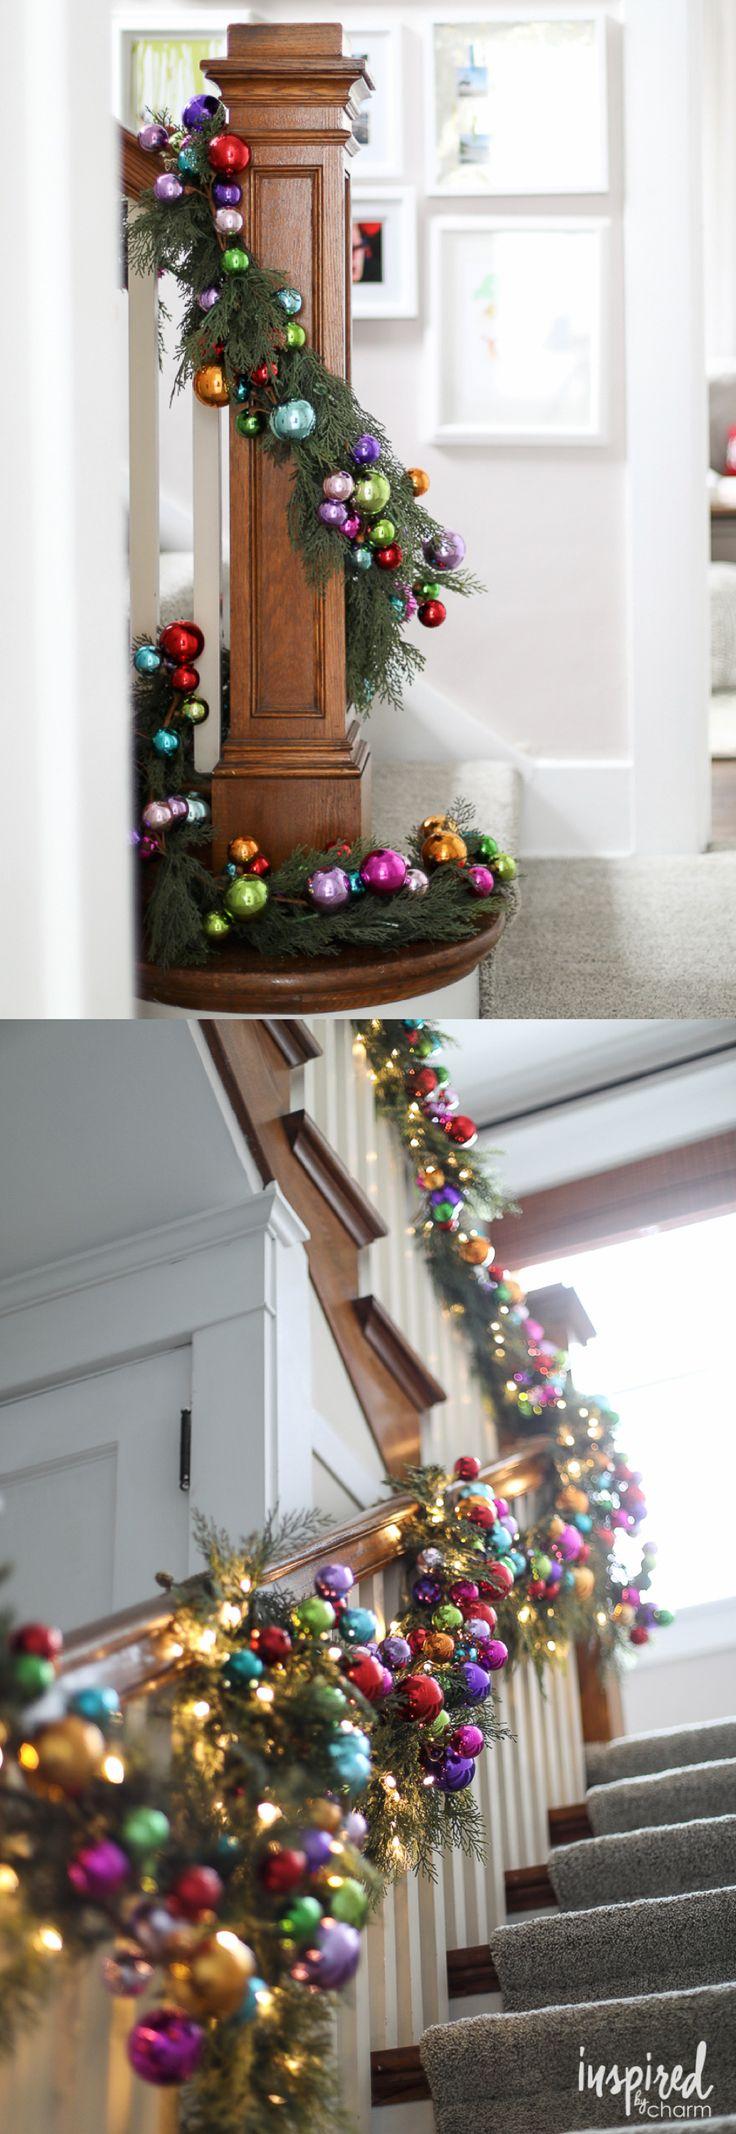 Colorful Christmas Ornament and Pine Banister Garland | Holiday Home Tour 2016 via inspiredbycharm.com